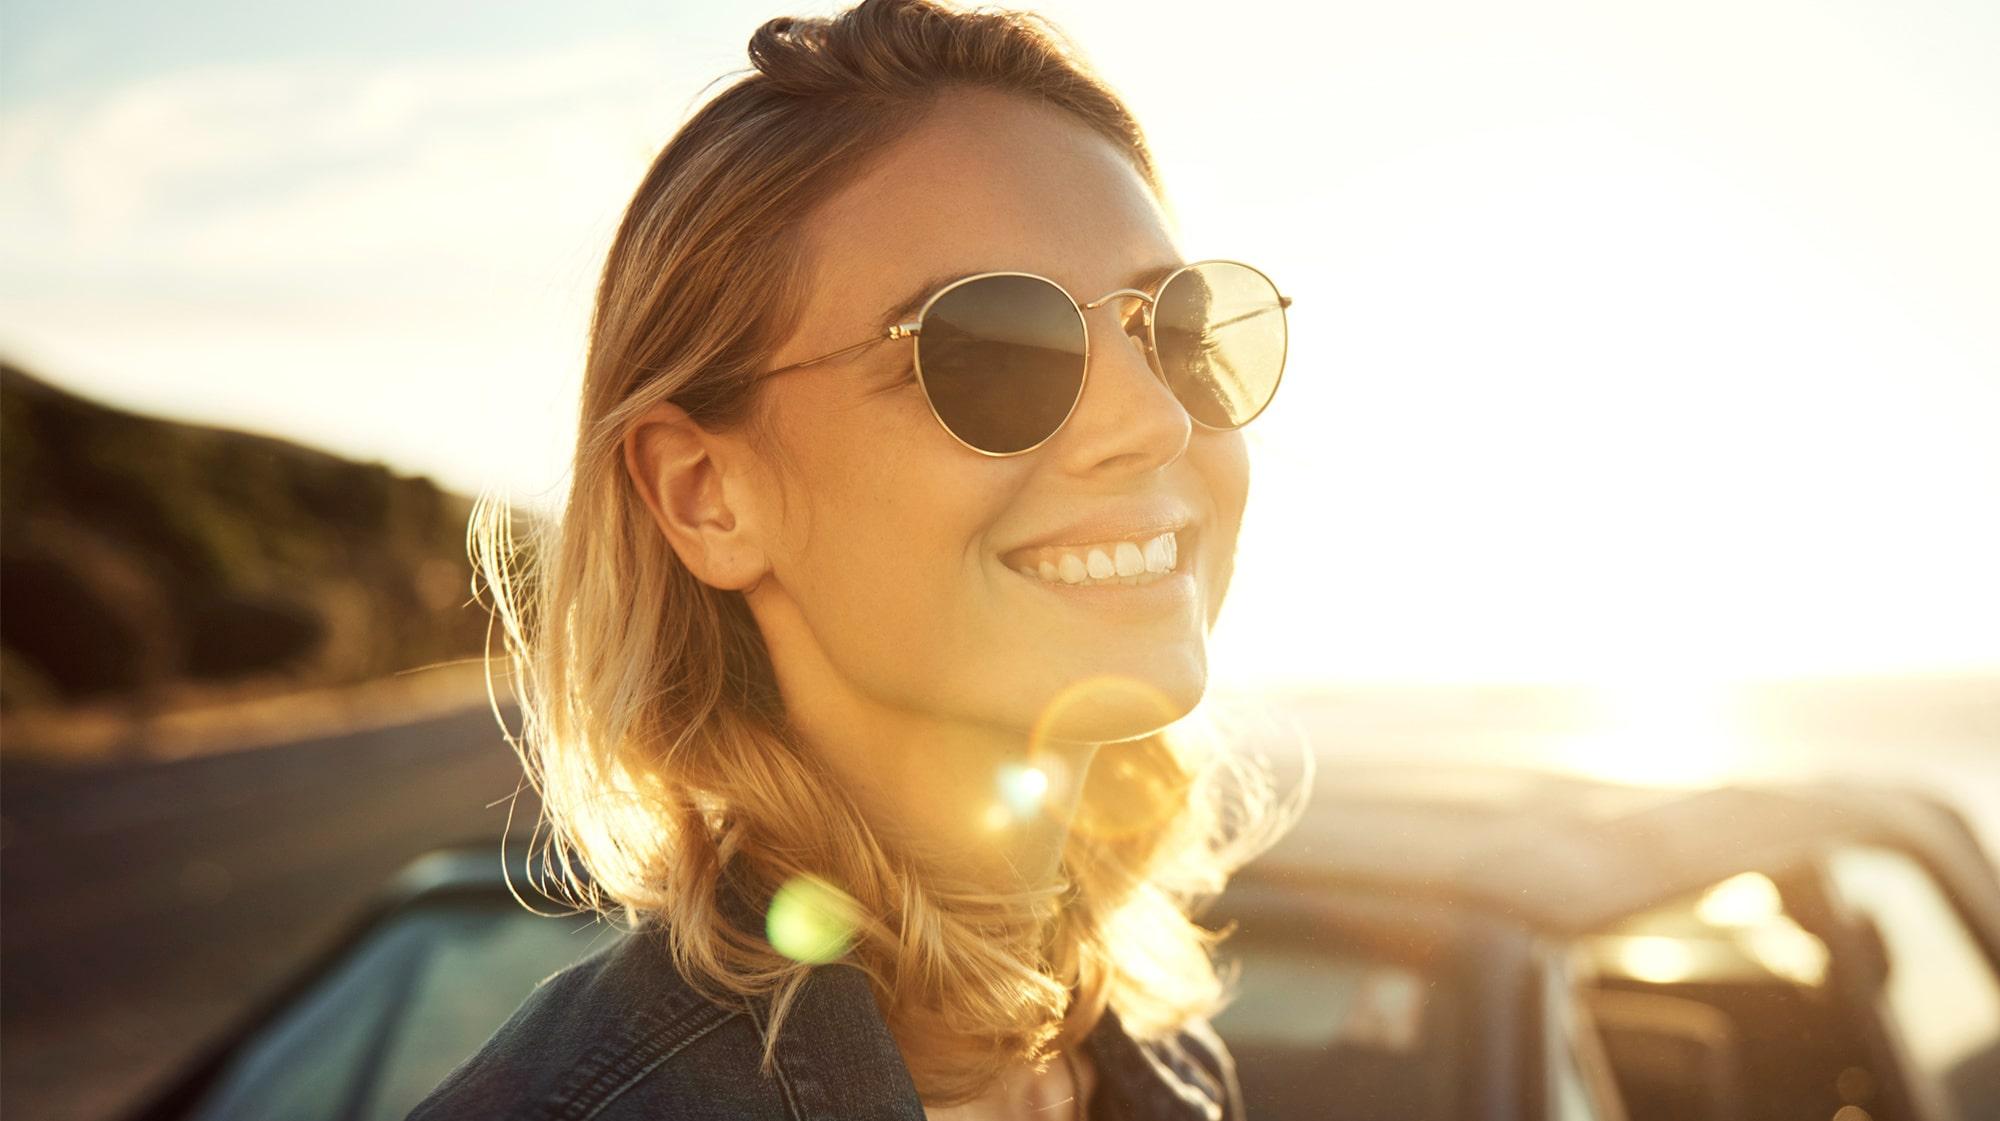 Solglasögon 2018 – så vet du vilken modell som passar dig